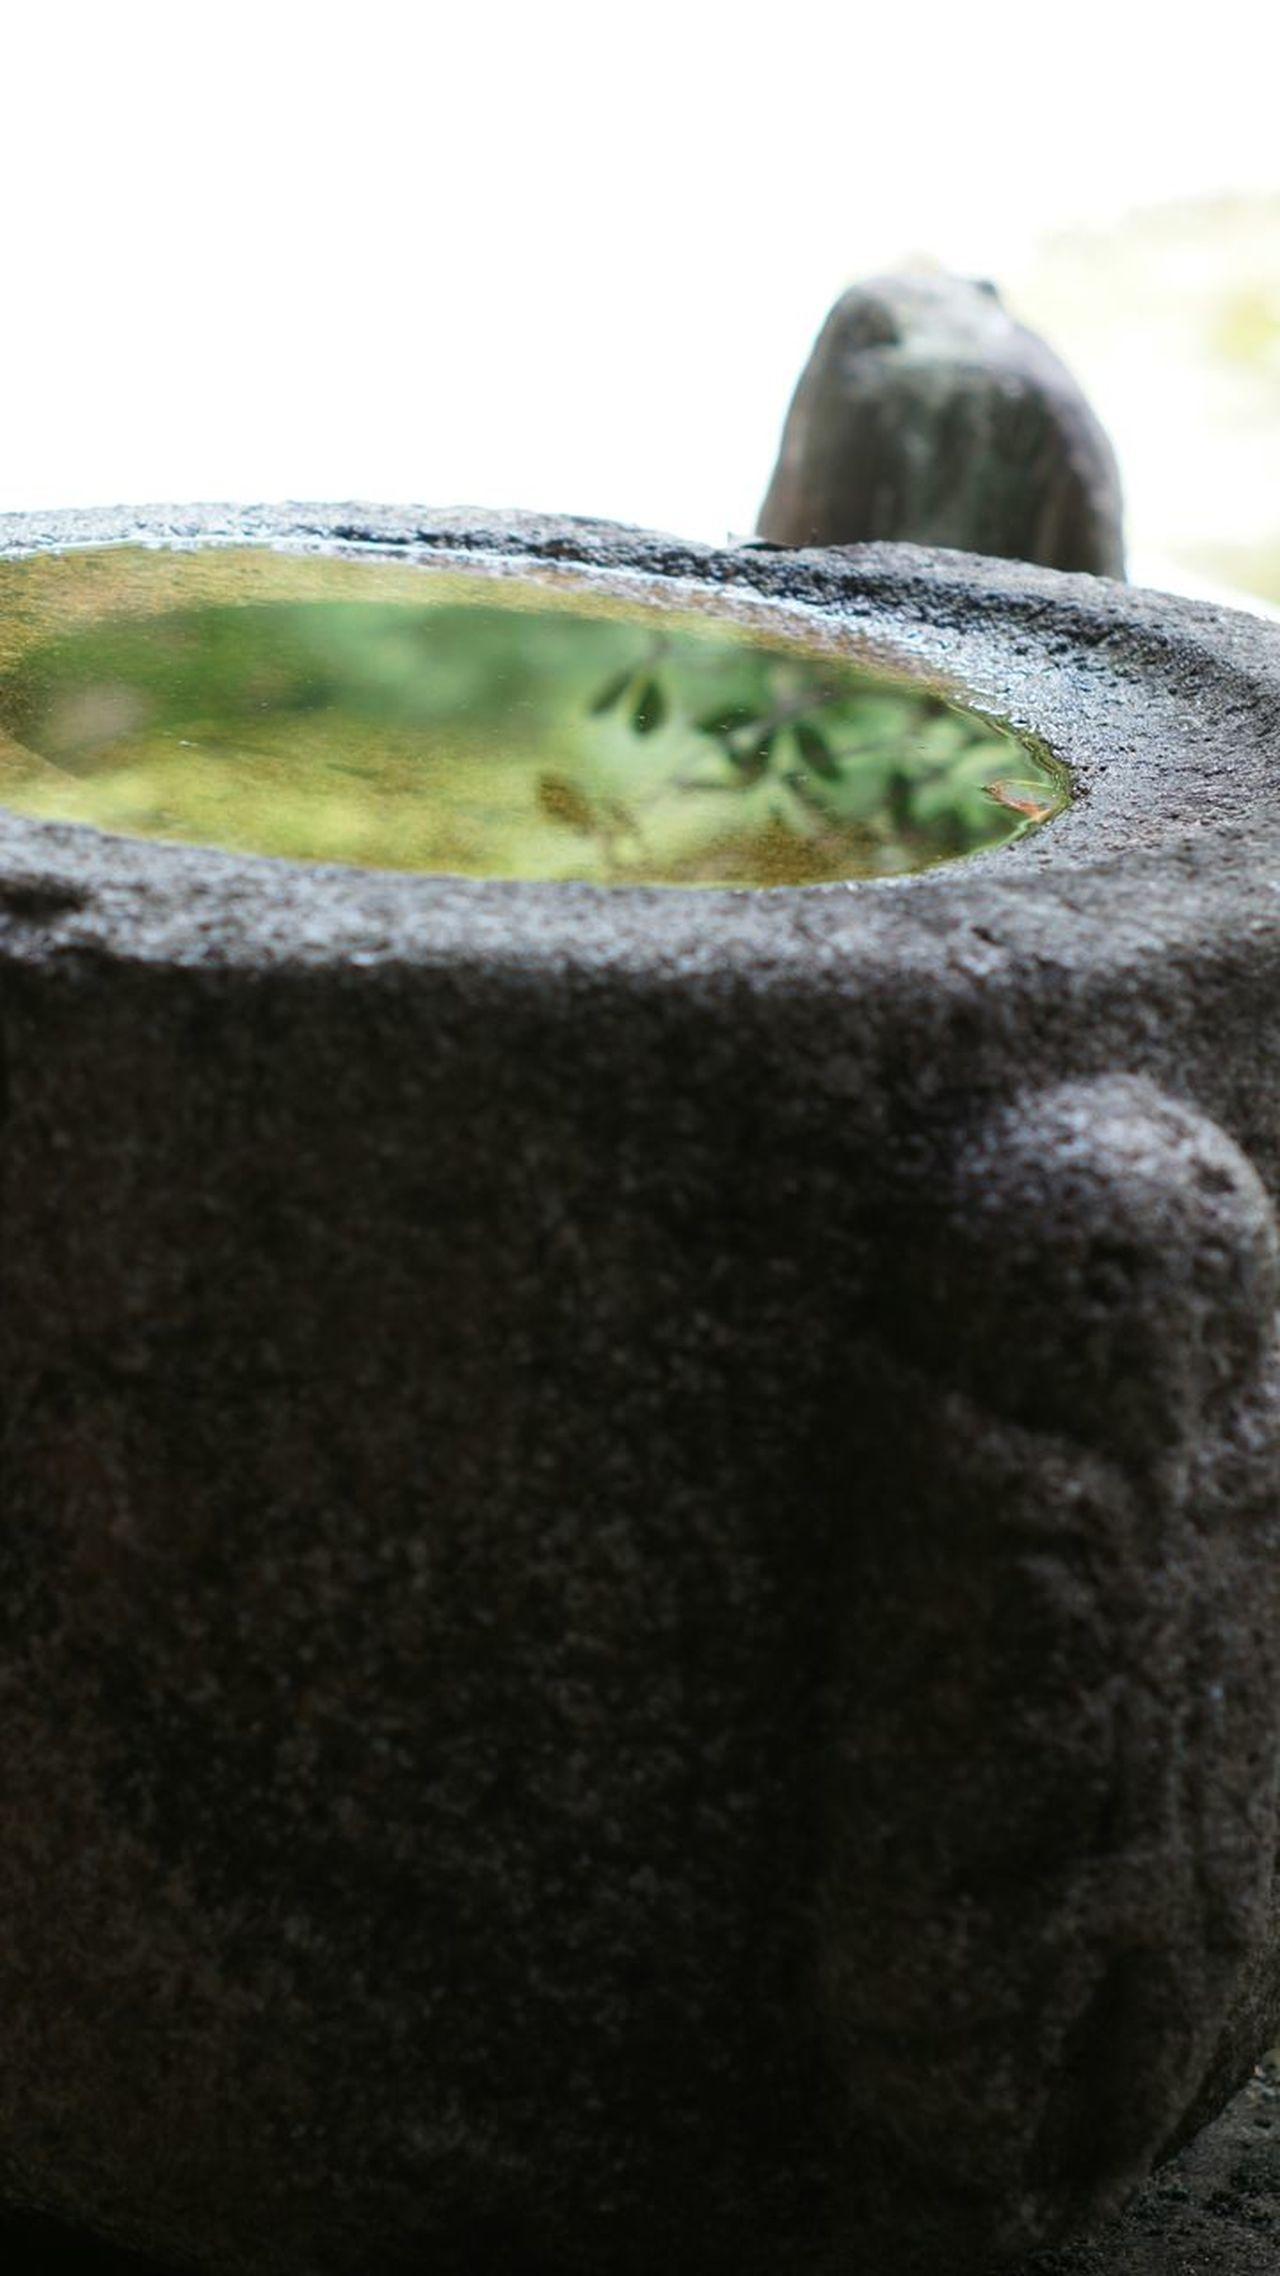 Day Nex5 Buddhist Temple Smc Takumar 55mm F1.8 Kyoto Outdoors